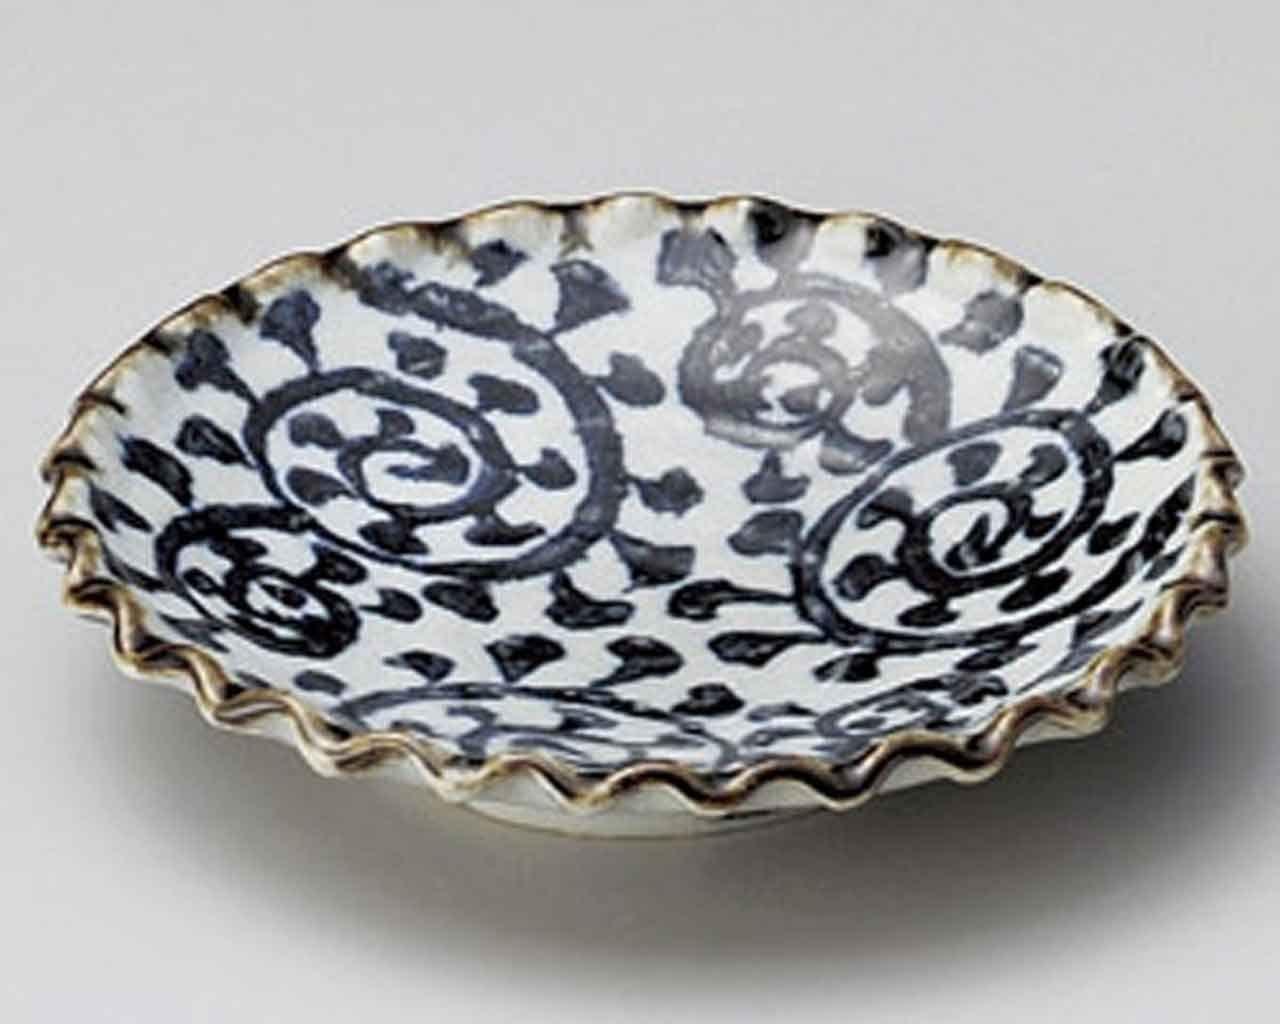 Tako Karakusa 7.9inch Set of 2 Small Plates Grey Ceramic Made in Japan